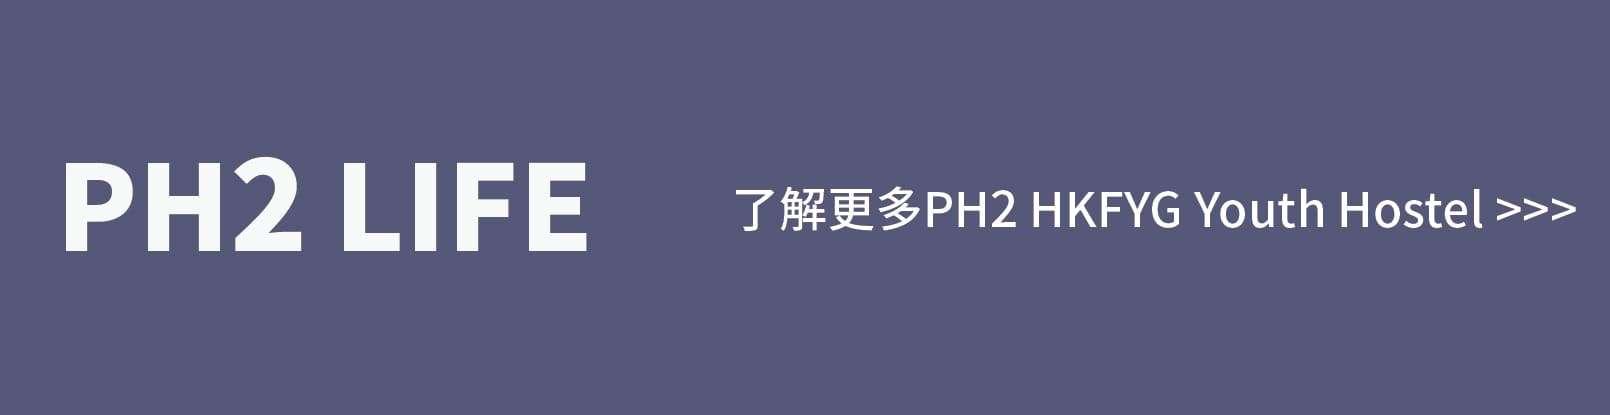 ph2 life